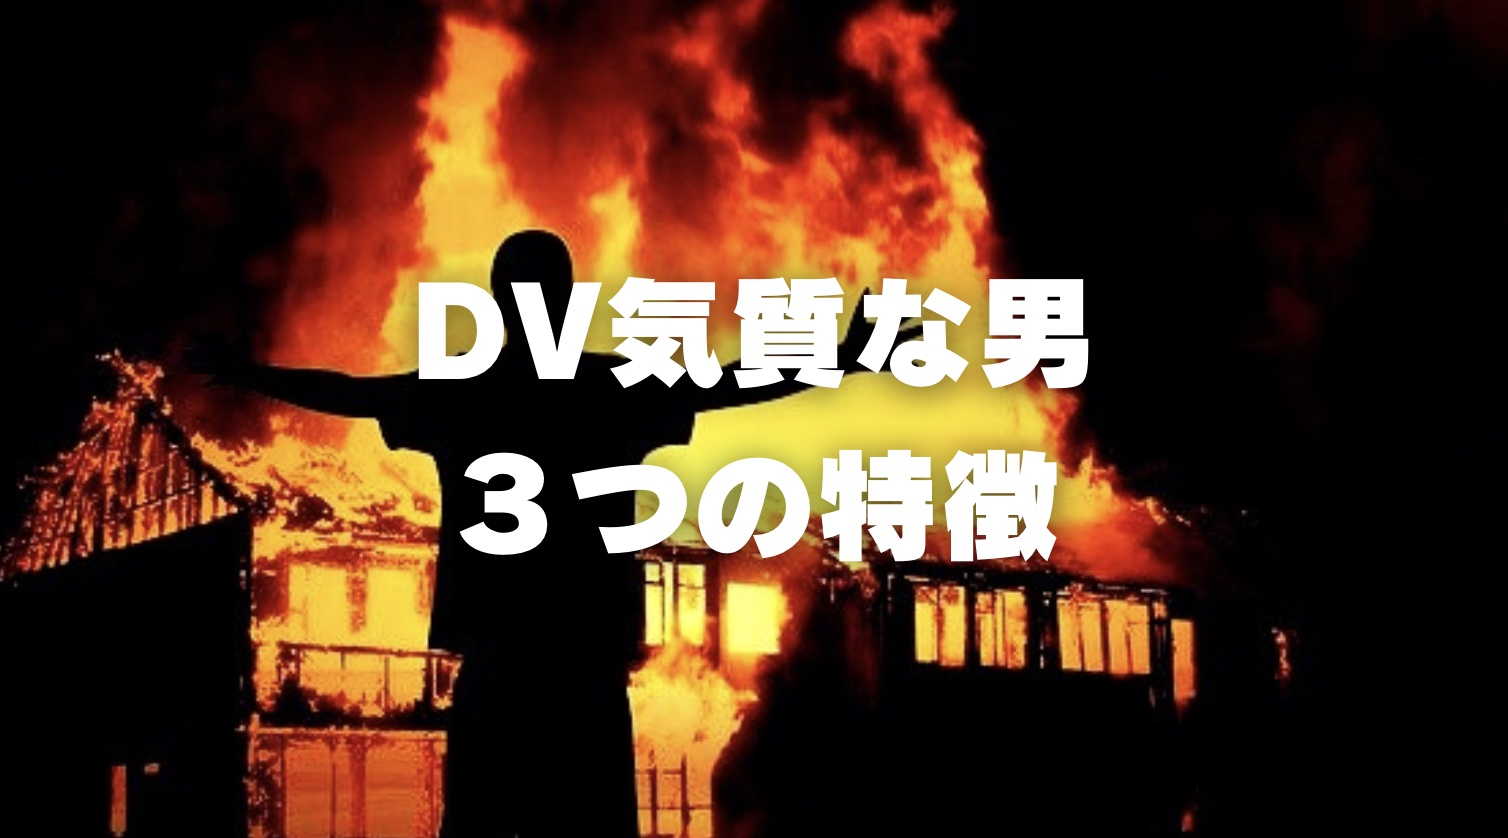 DV気質な男3つの特徴のアイキャッチ画像